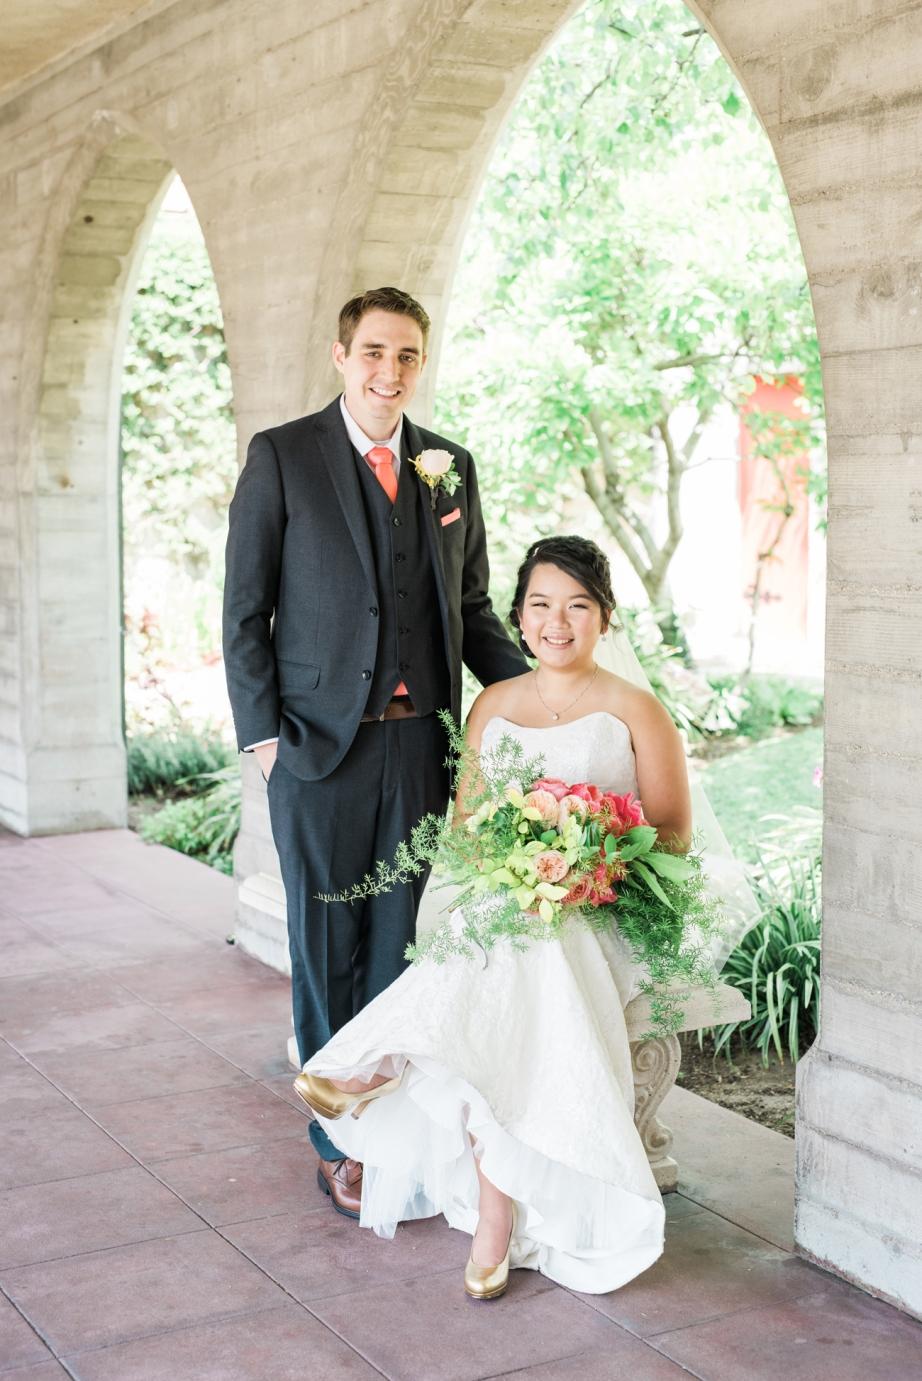 st-marks-episcopal-church-wedding-photo-025